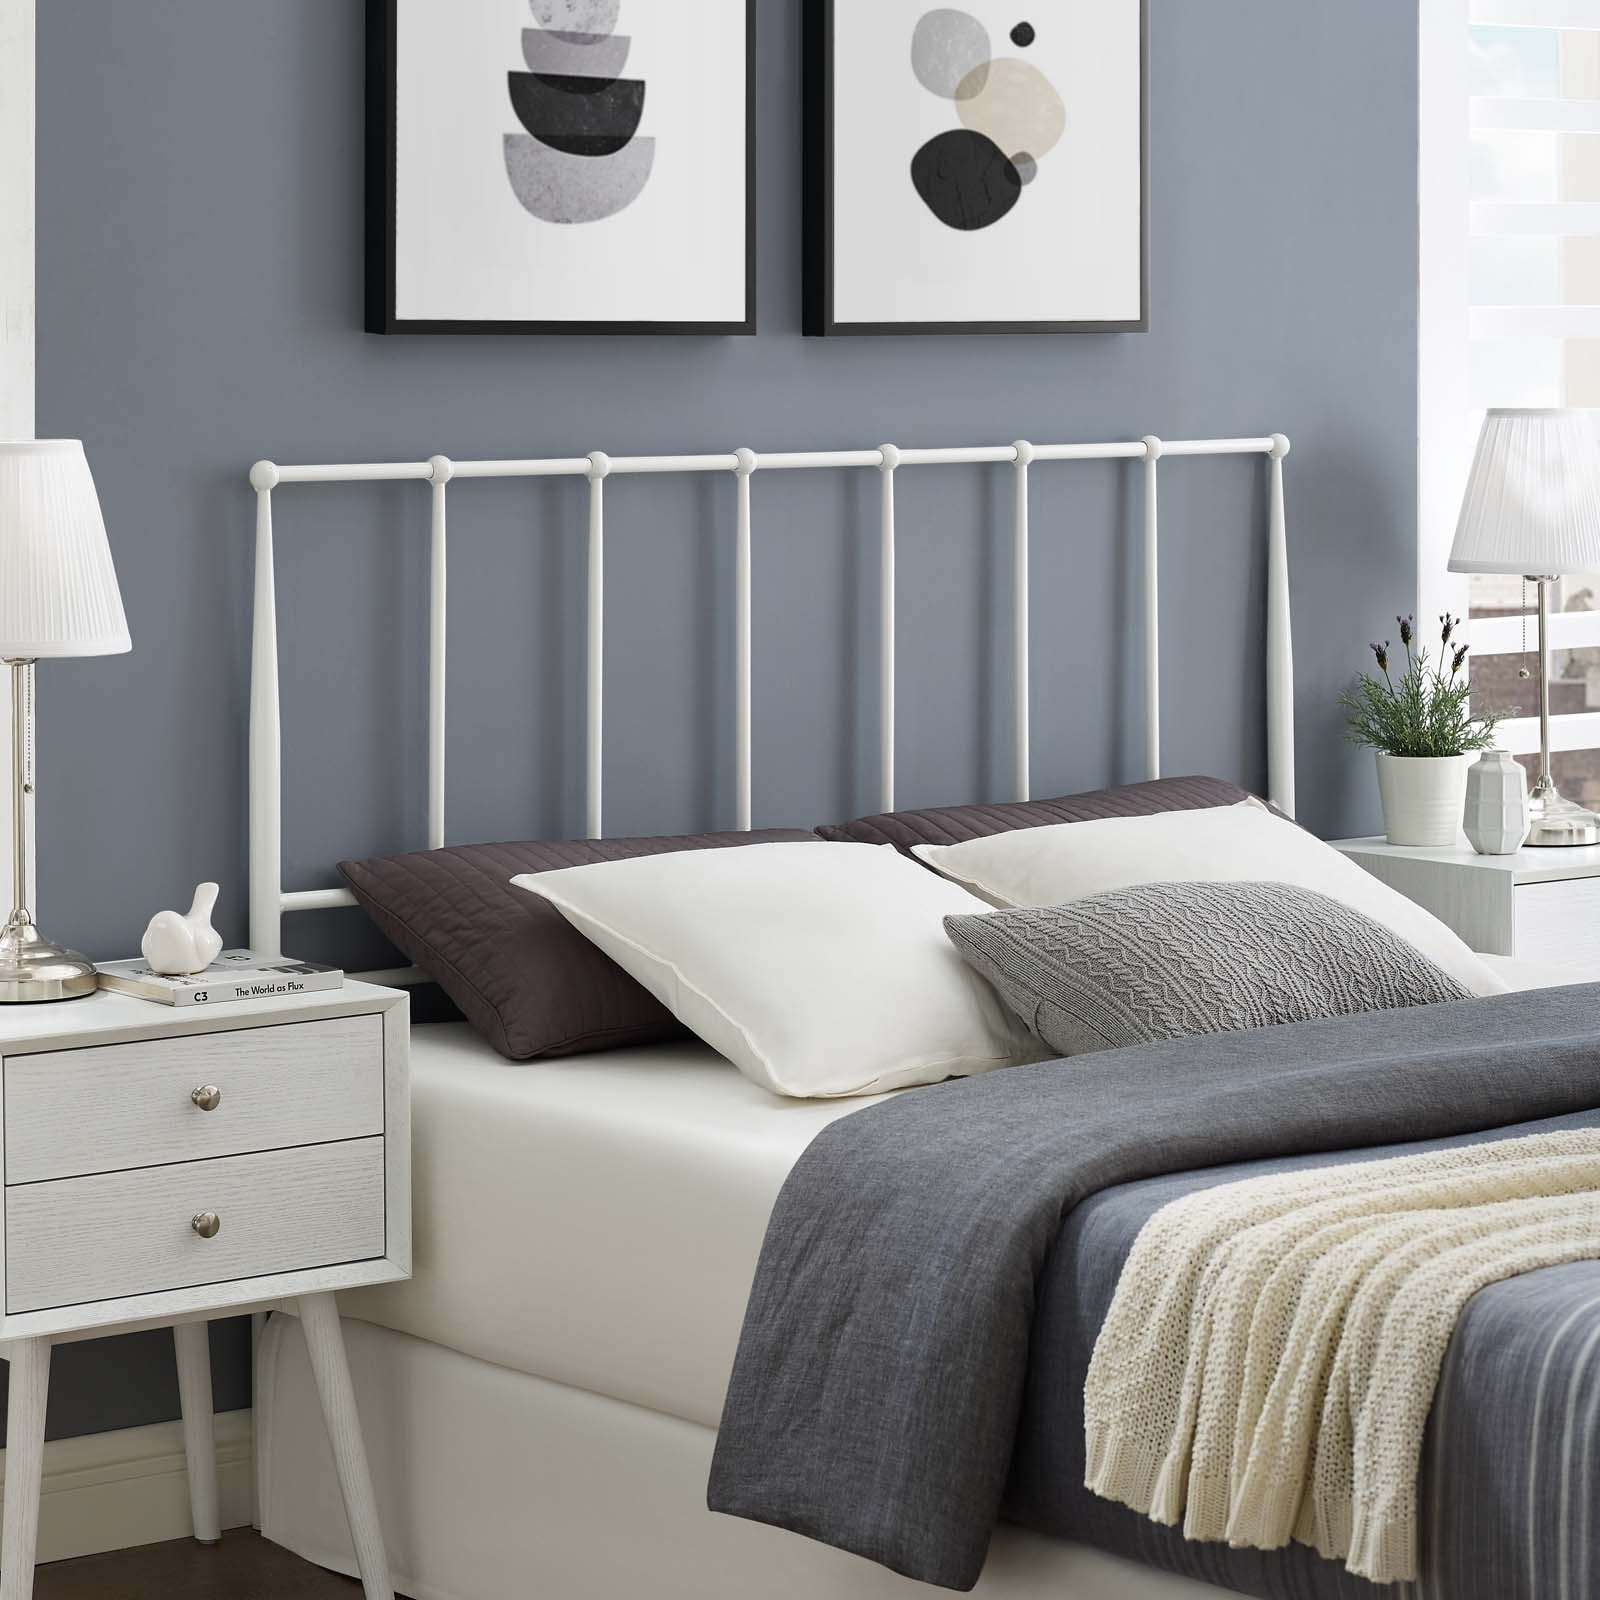 Kiana Metal Stainless Steel Headboard Beds Mattresses Bedding